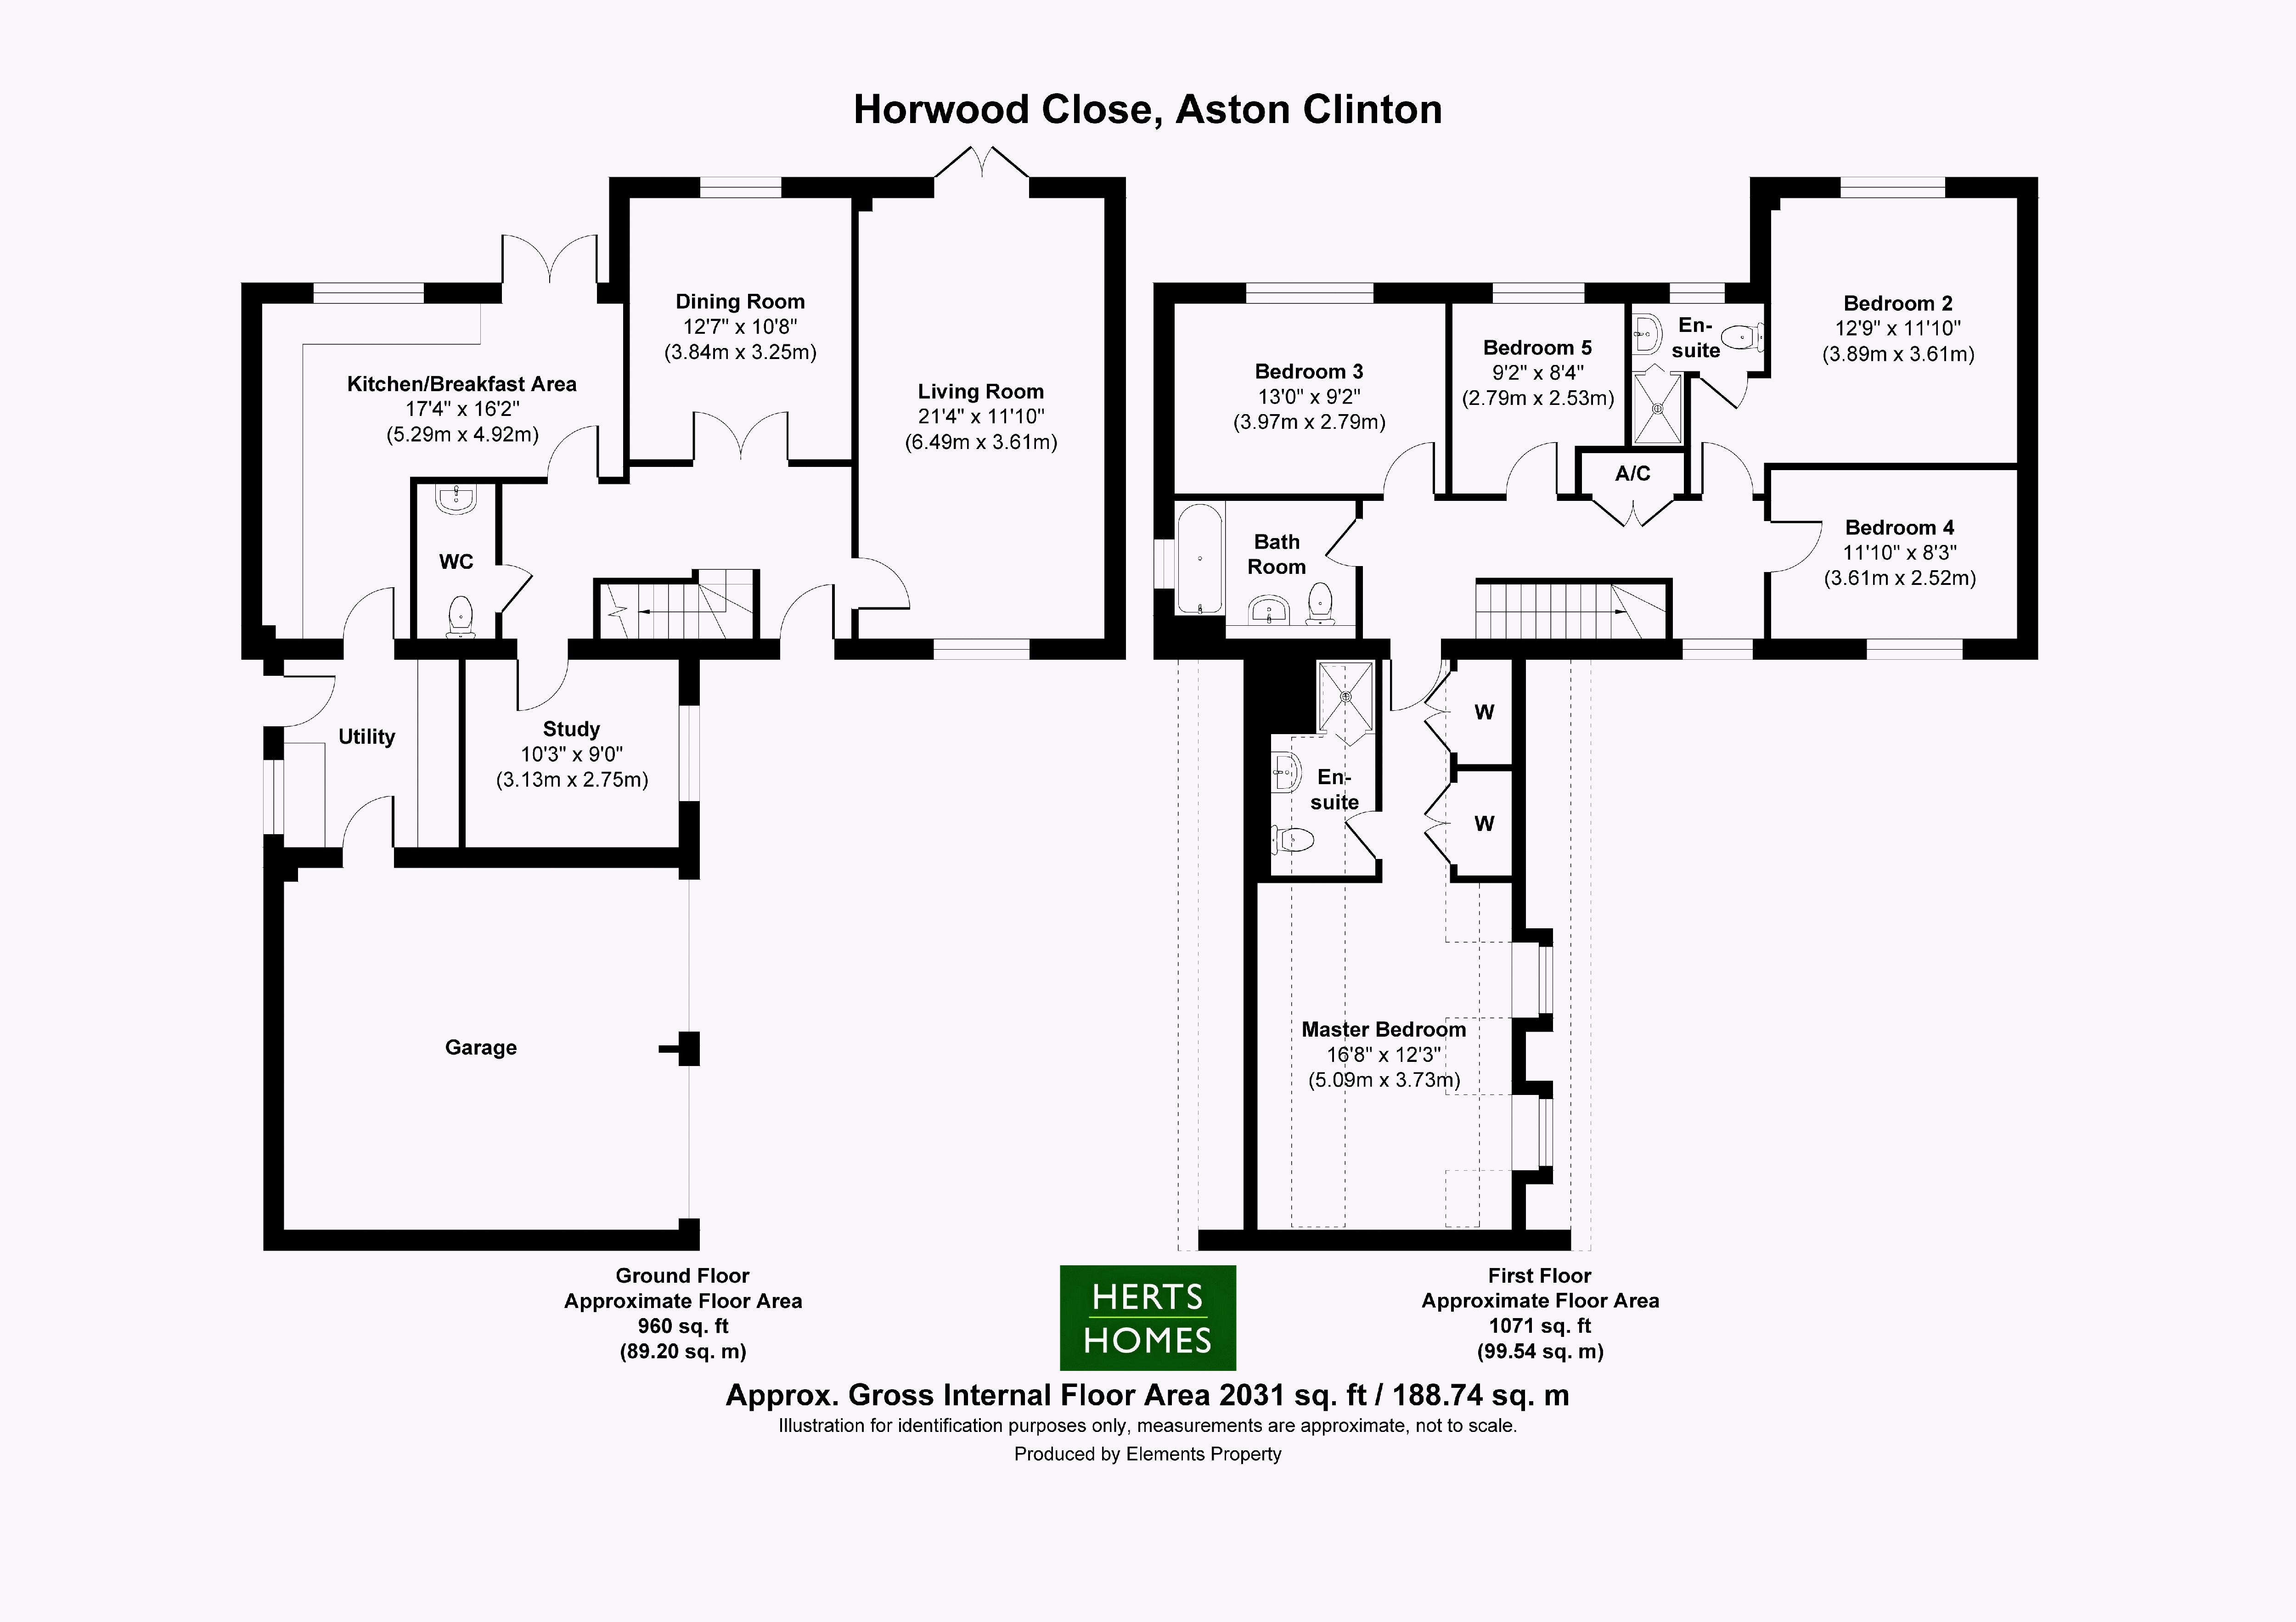 Horwood Close Aston Clinton